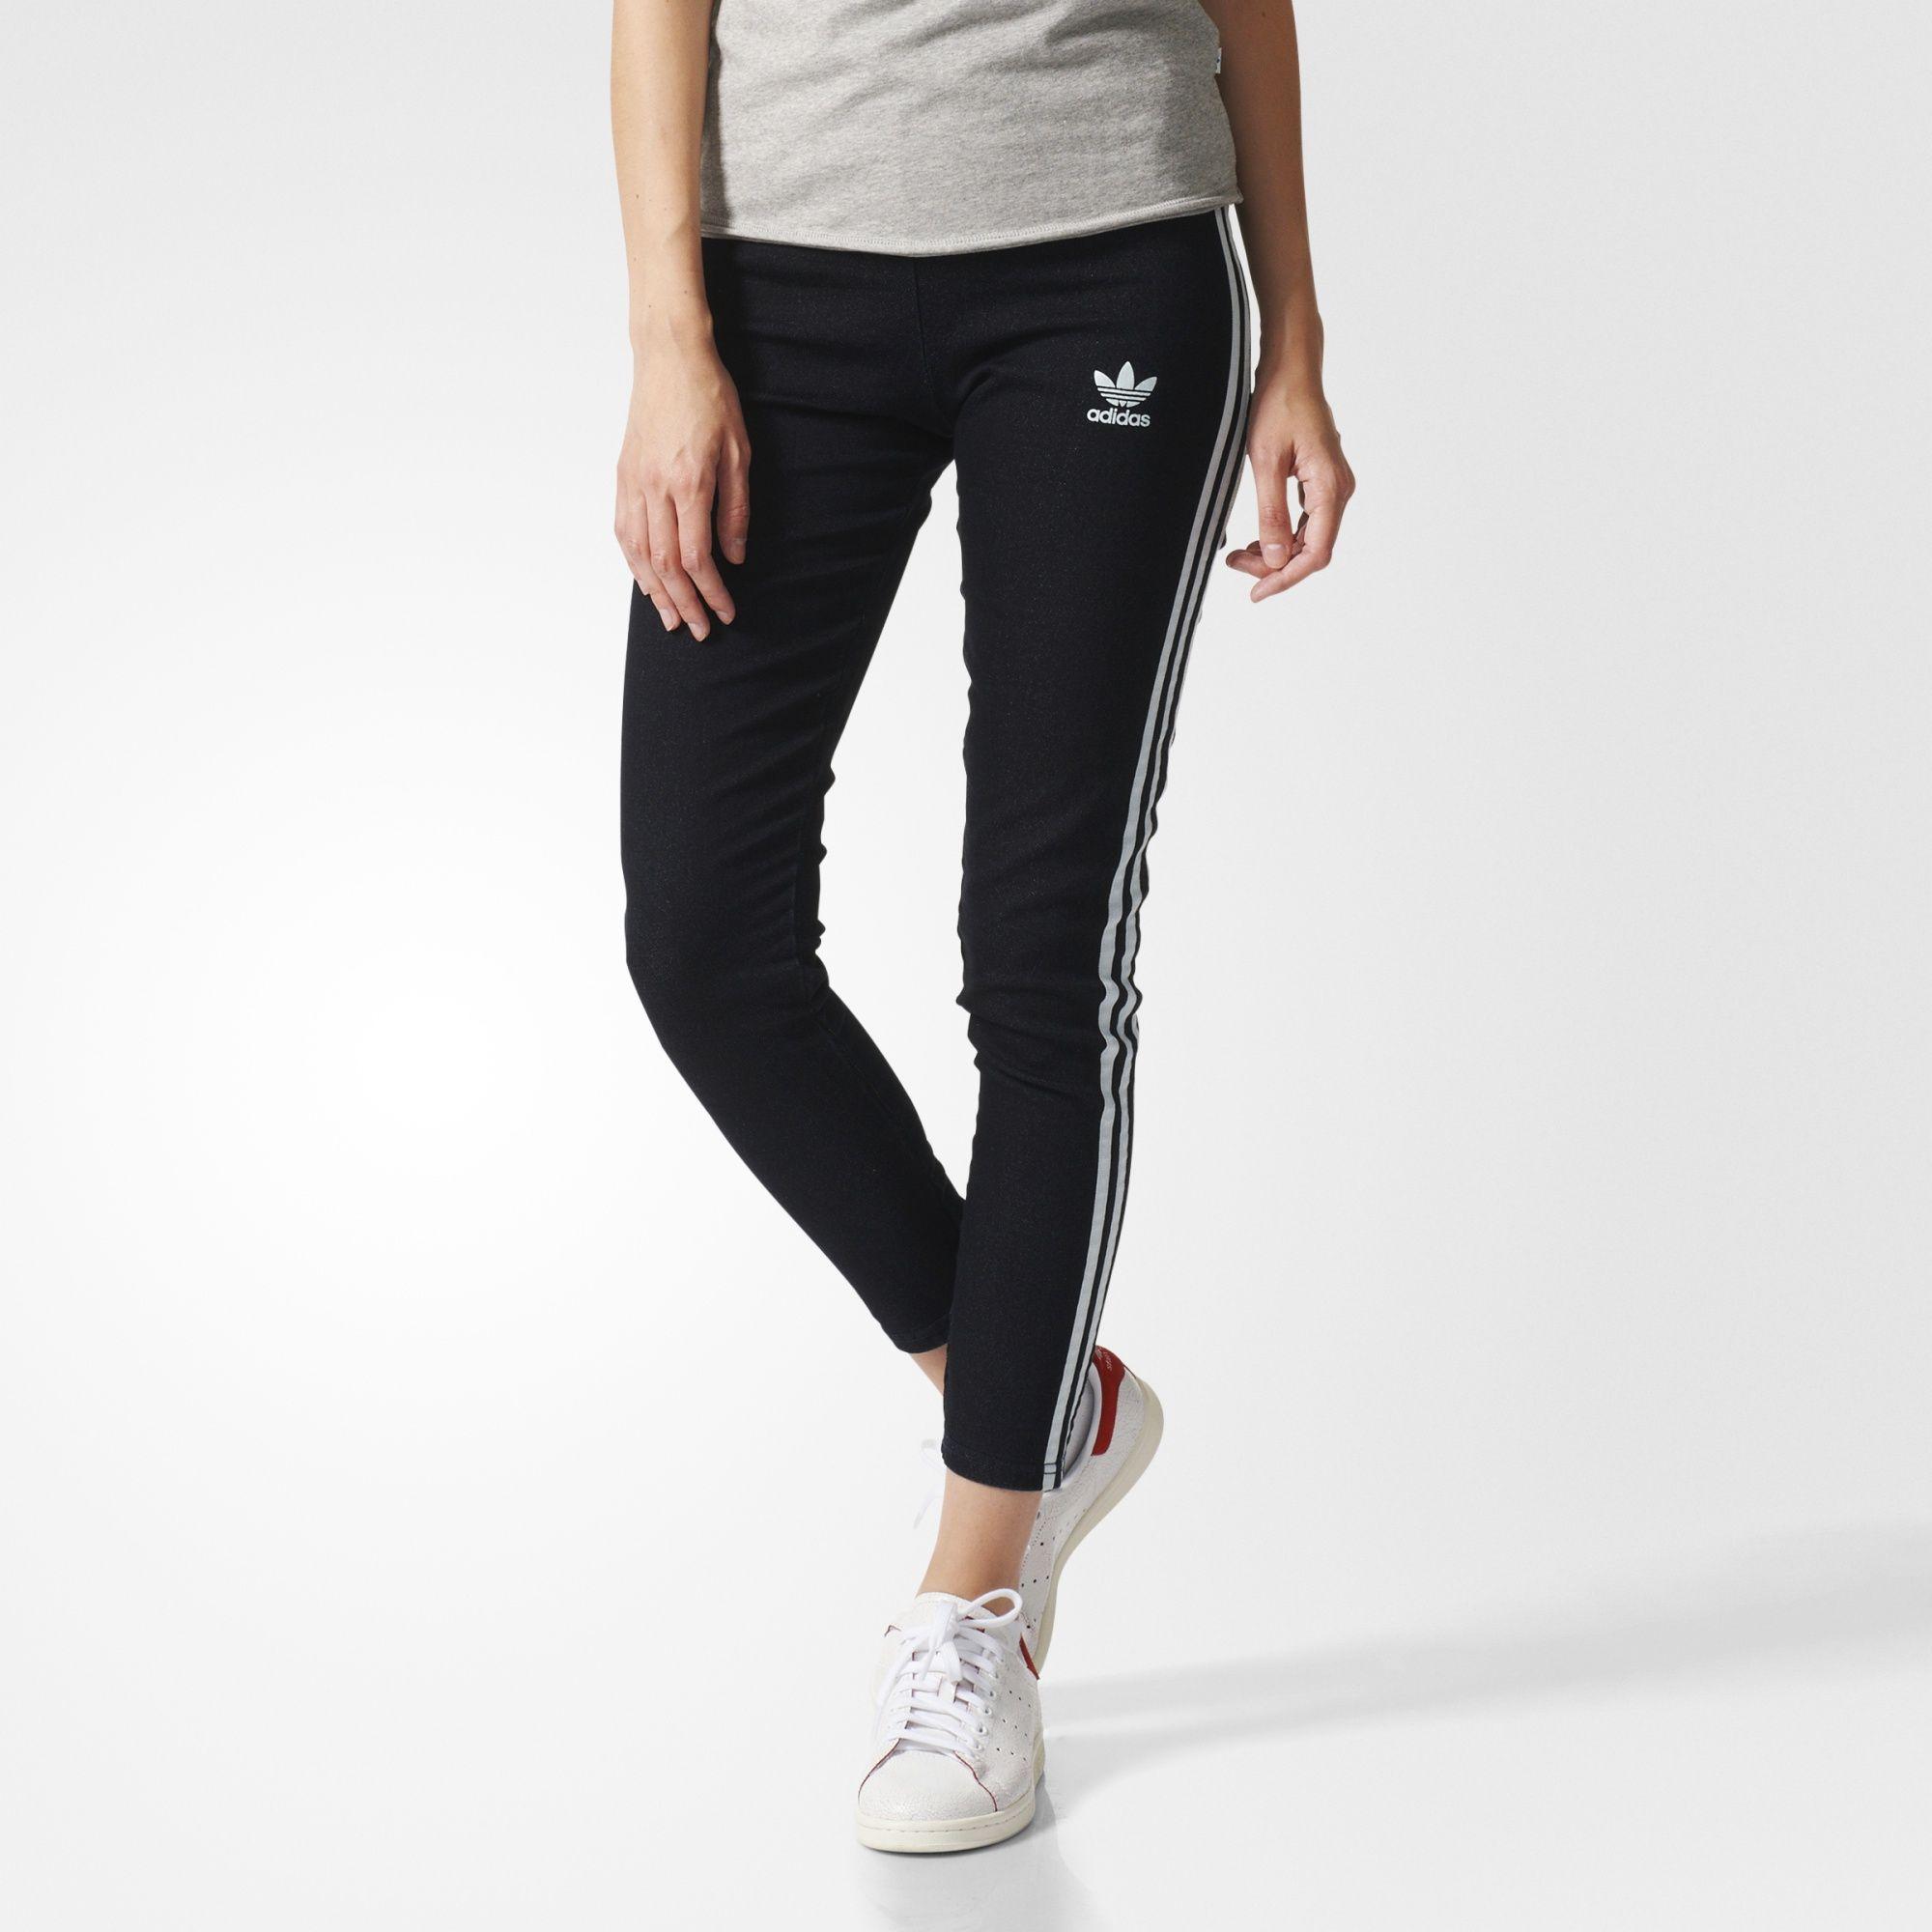 91ee93b8ed911b Online adidas Originals Baggy Tapered Pants Sportswear for Women Shop  Womens Sportswear COLOUR-black